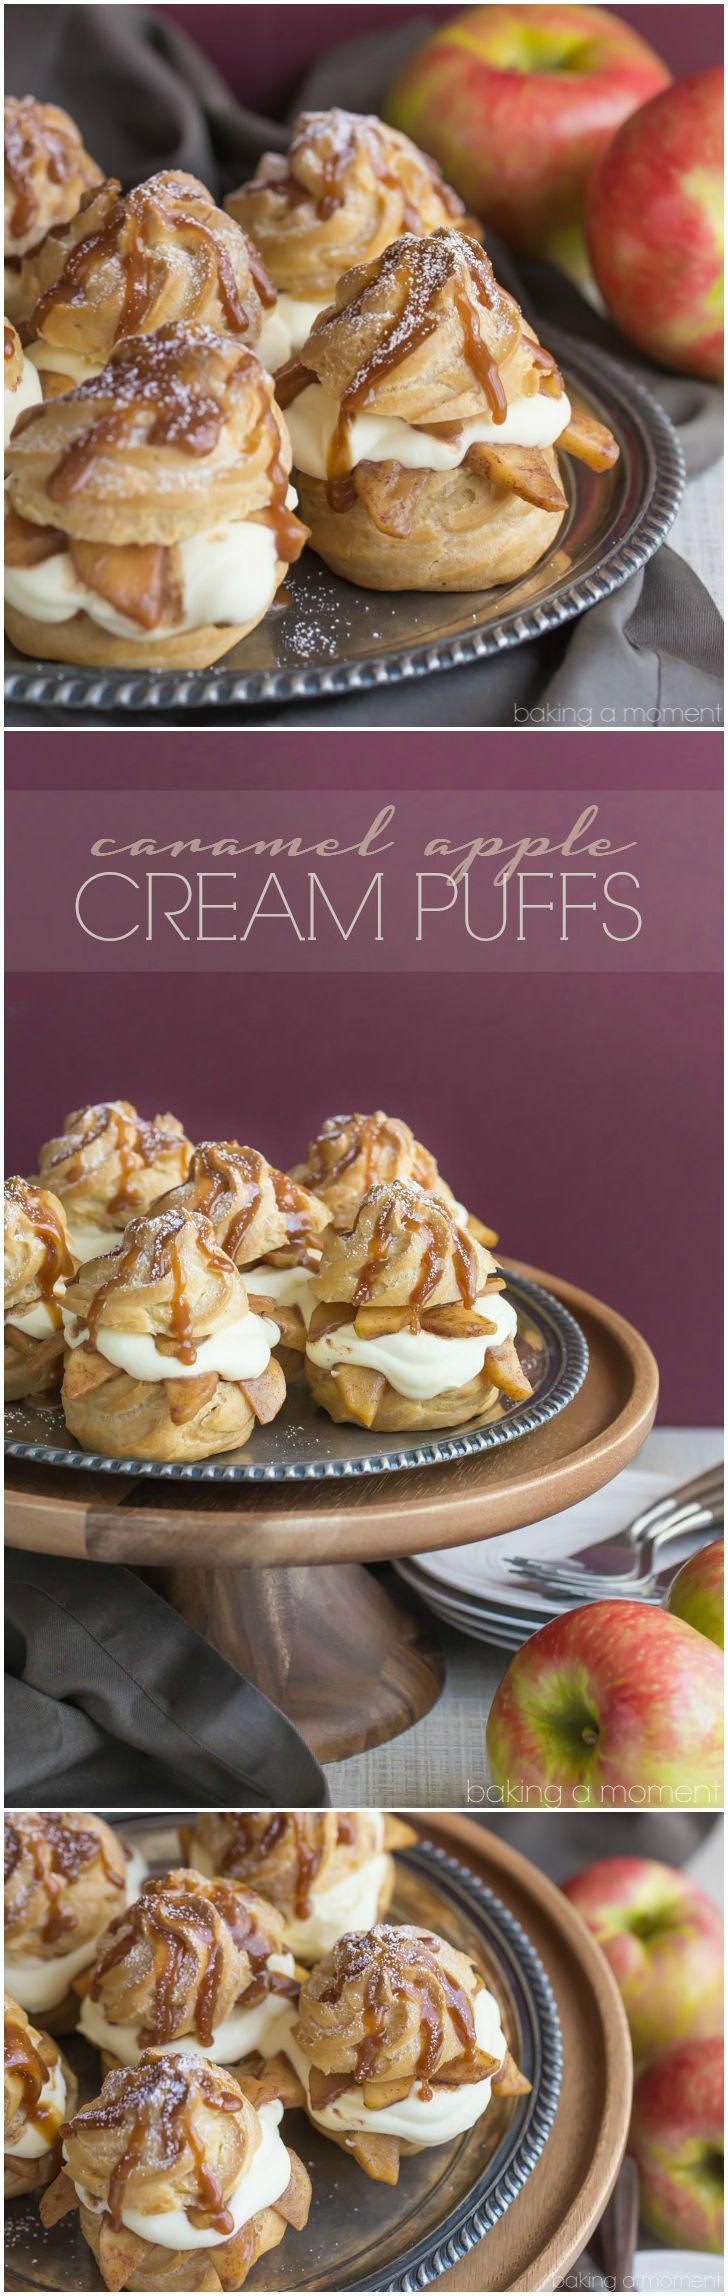 Great Fall Desserts  Best 25 Recipe for cream puffs ideas on Pinterest